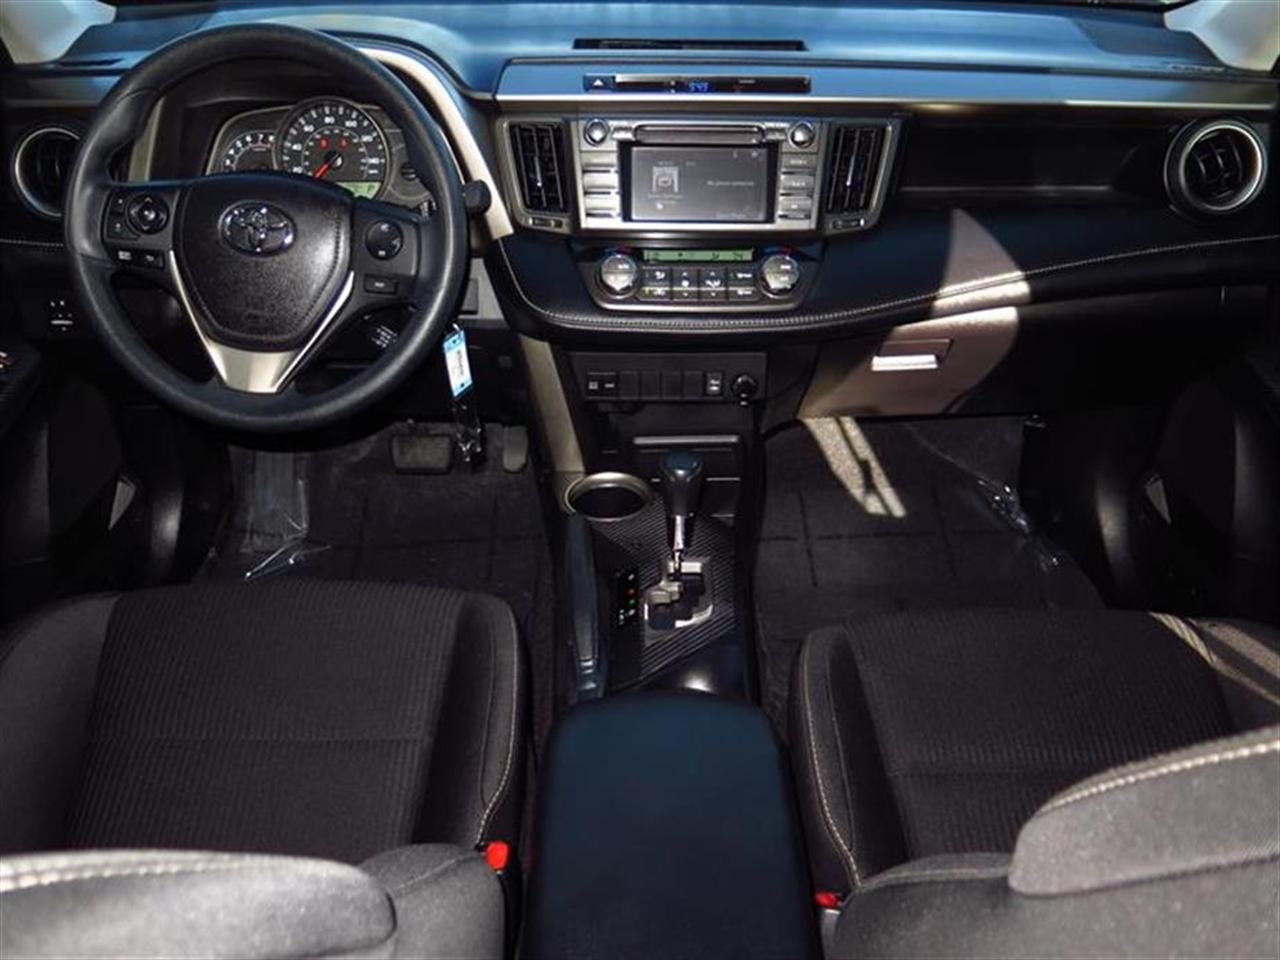 2014 TOYOTA RAV4 FWD 4dr XLE 15052 miles 2 12V DC Power Outlets 2 Seatback Storage Pockets 5 Pe